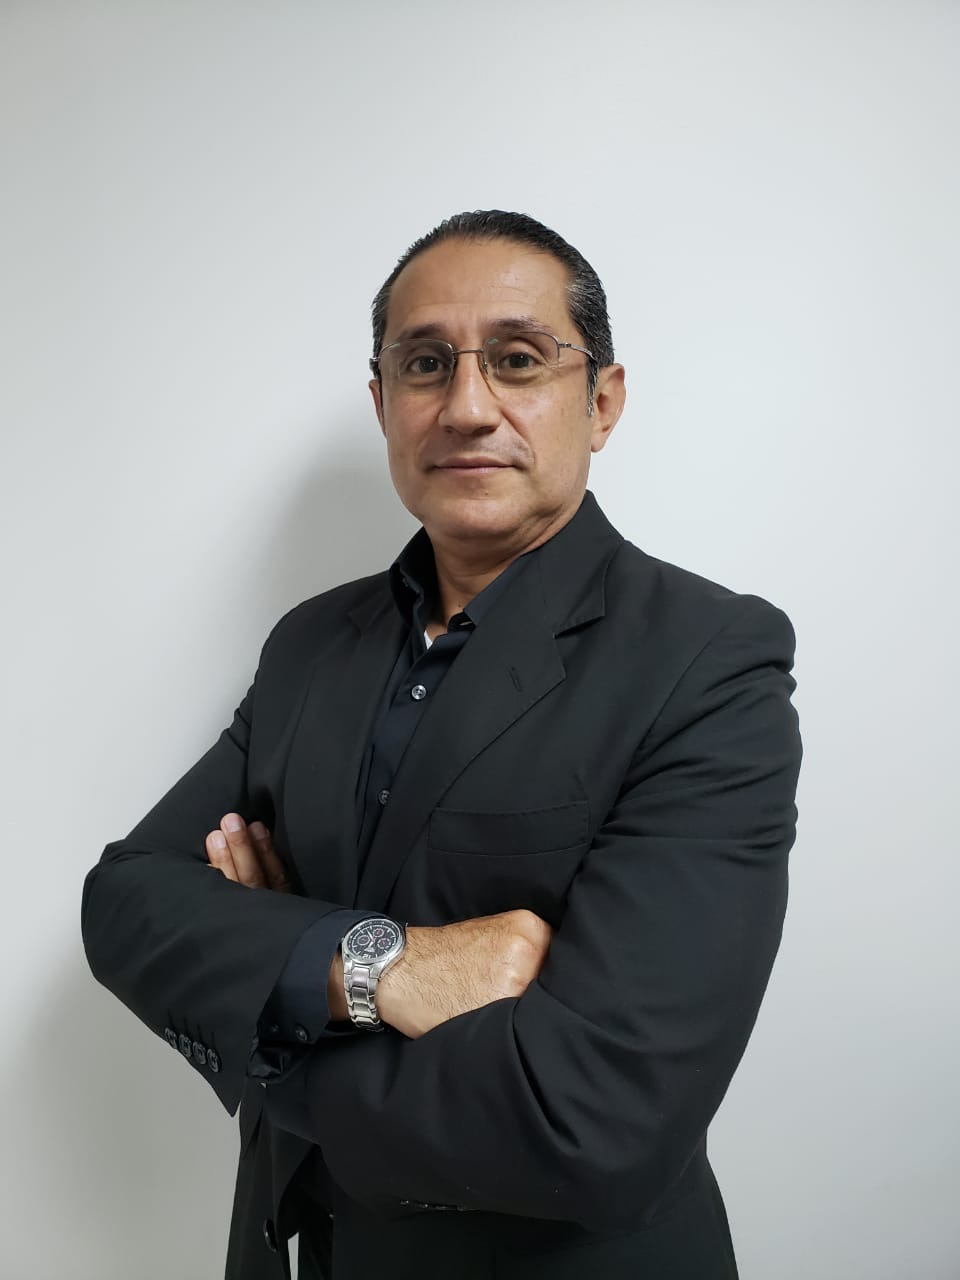 Juan Carlos Alzate Garcia